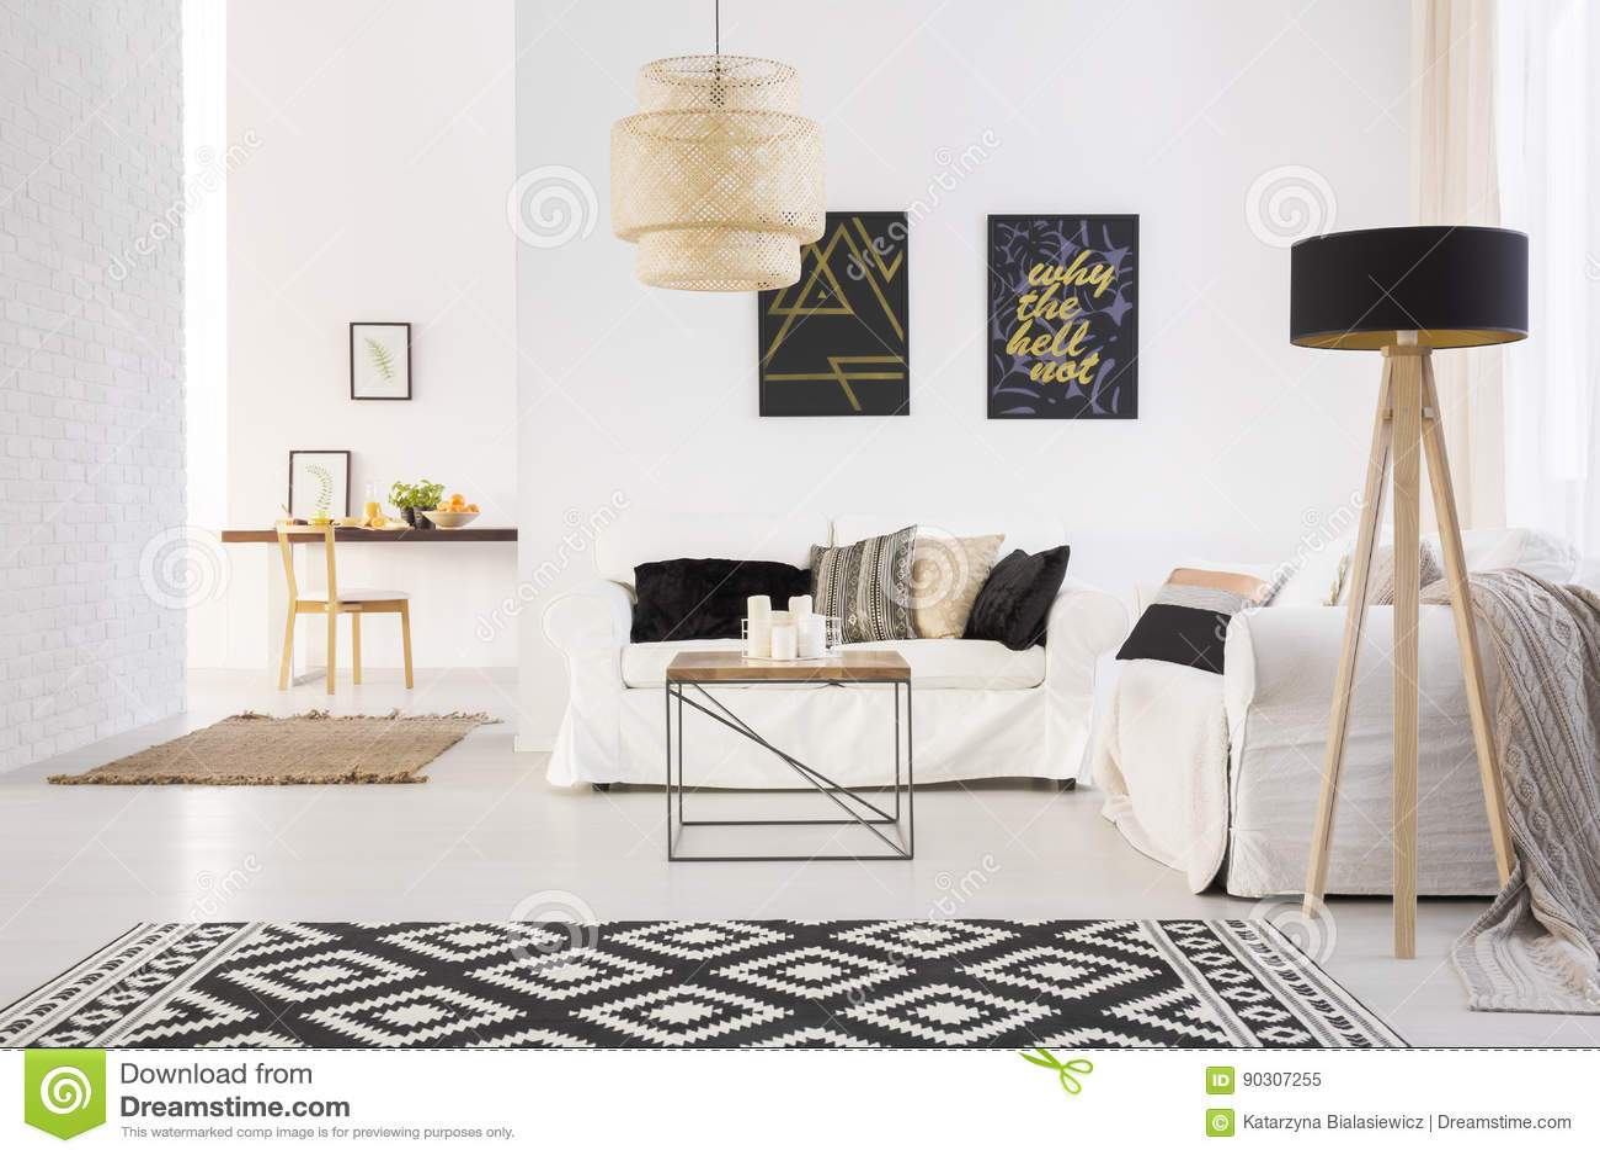 White cozy lounge